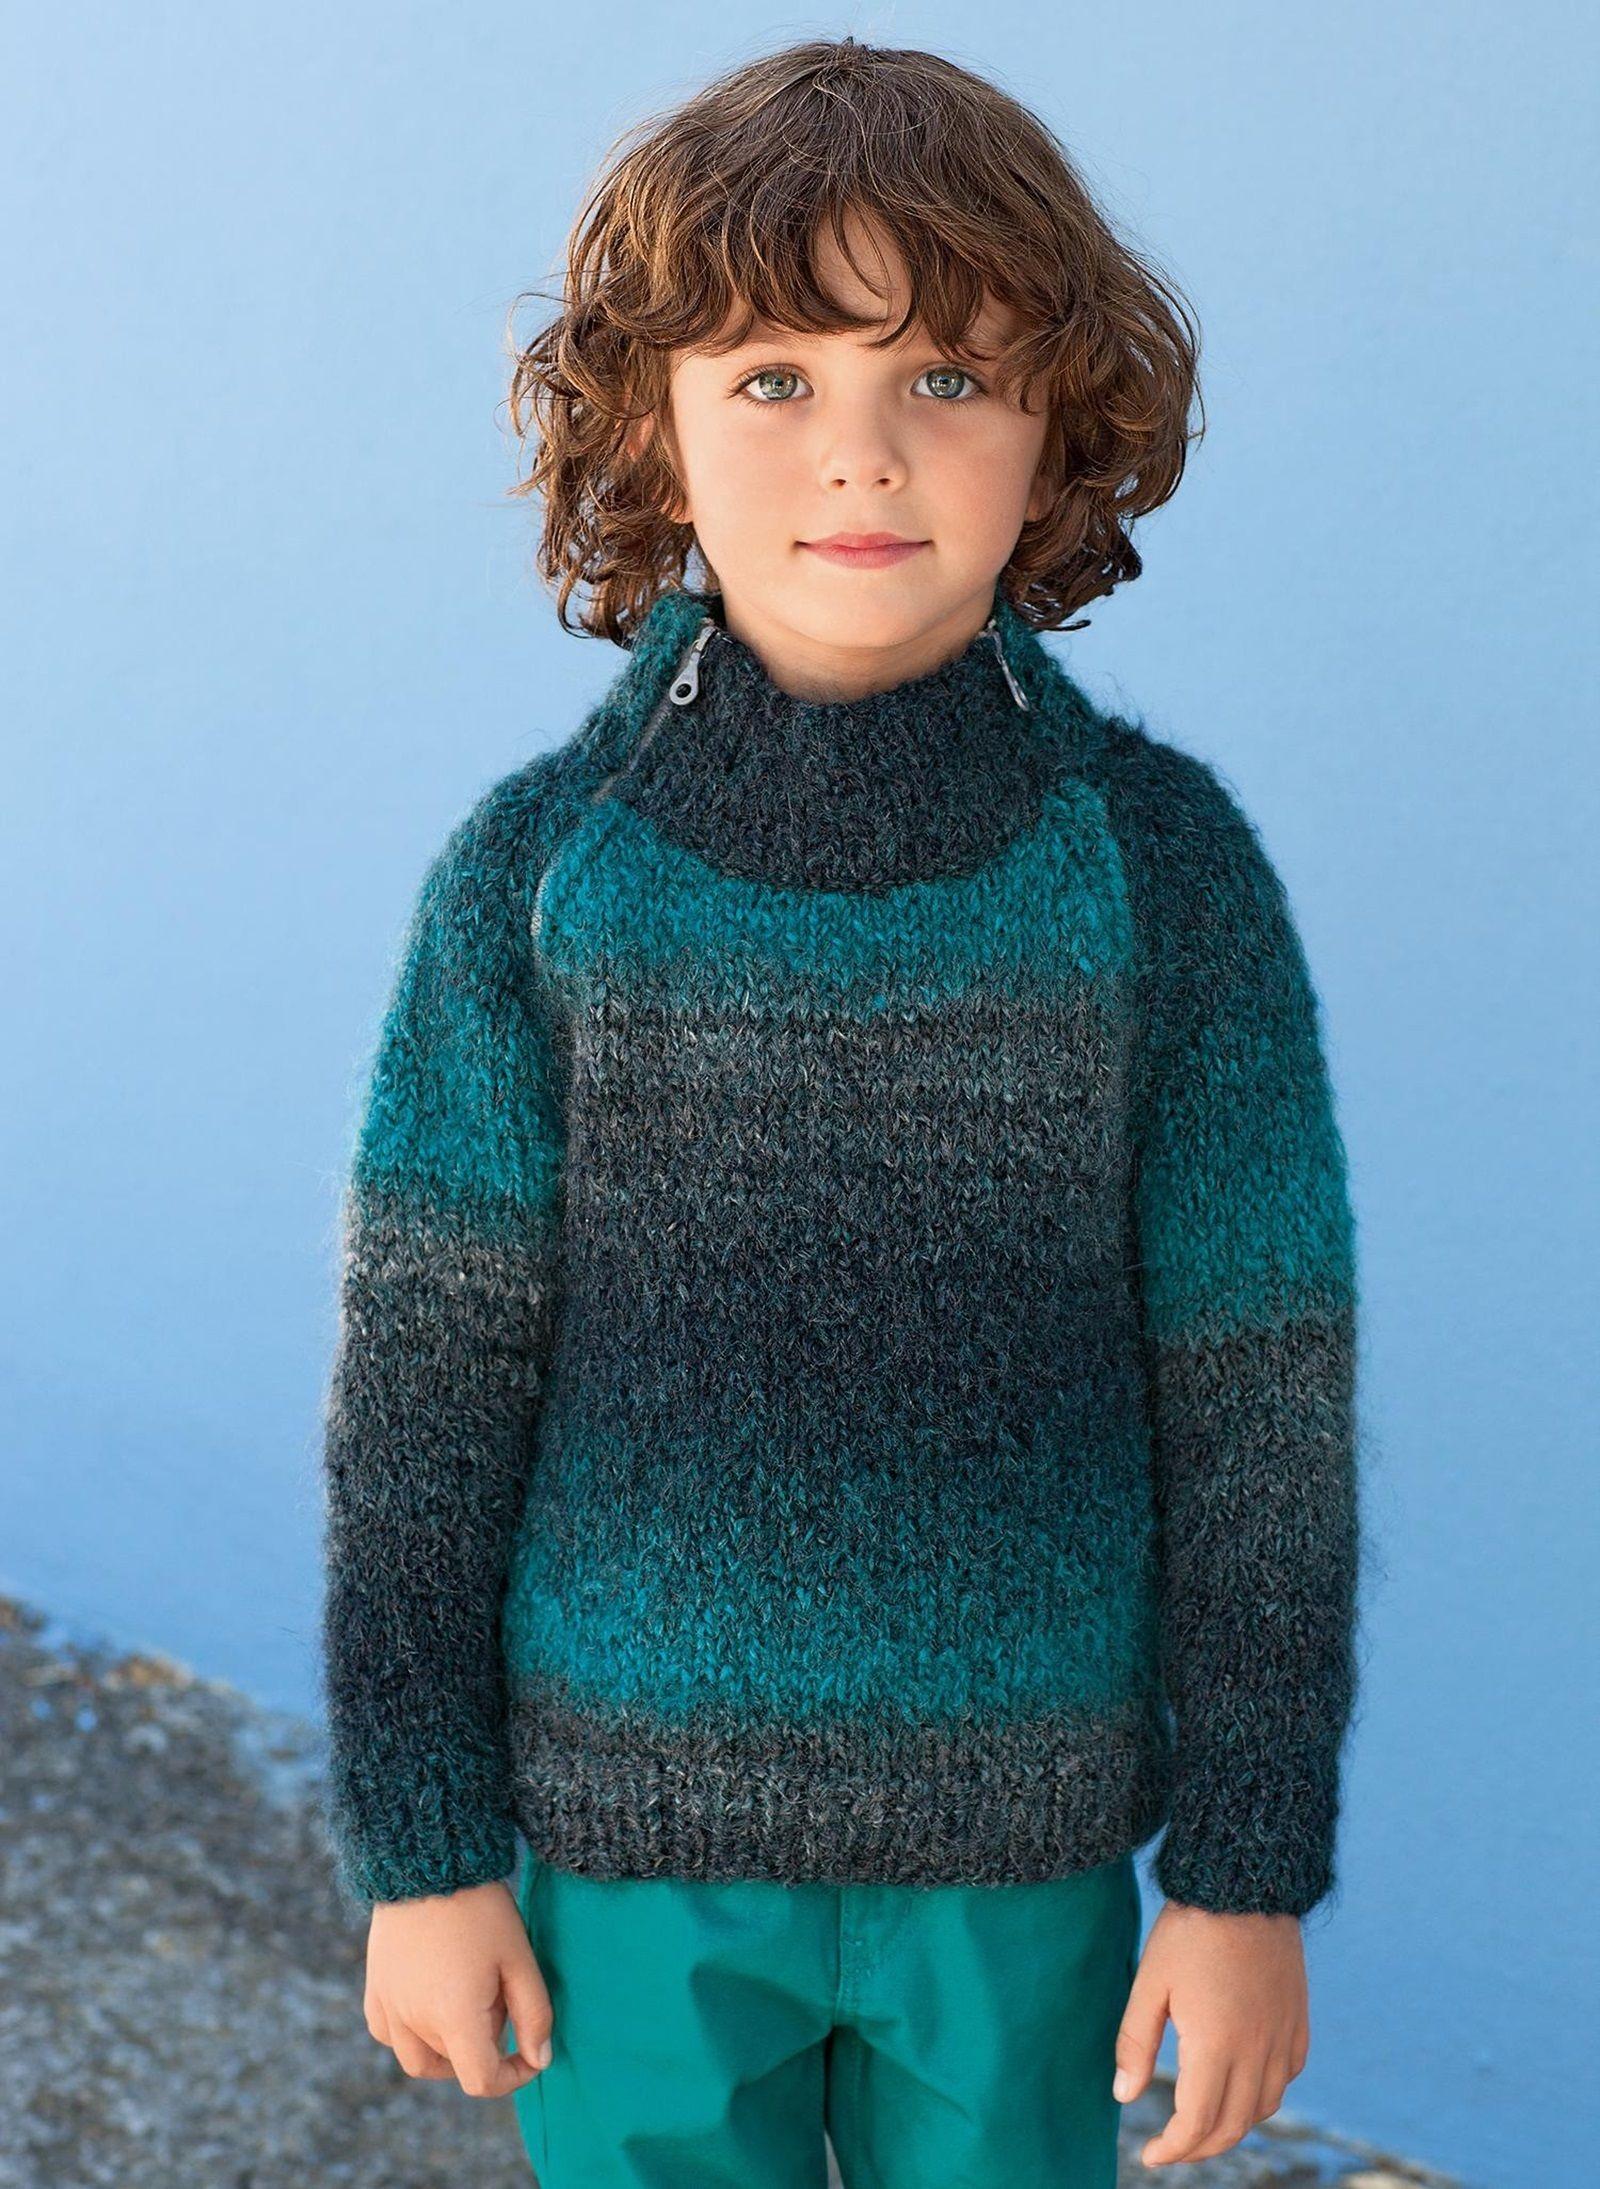 Pin on boys kids fuzzy fluffy mohair angora sweaters knits ...